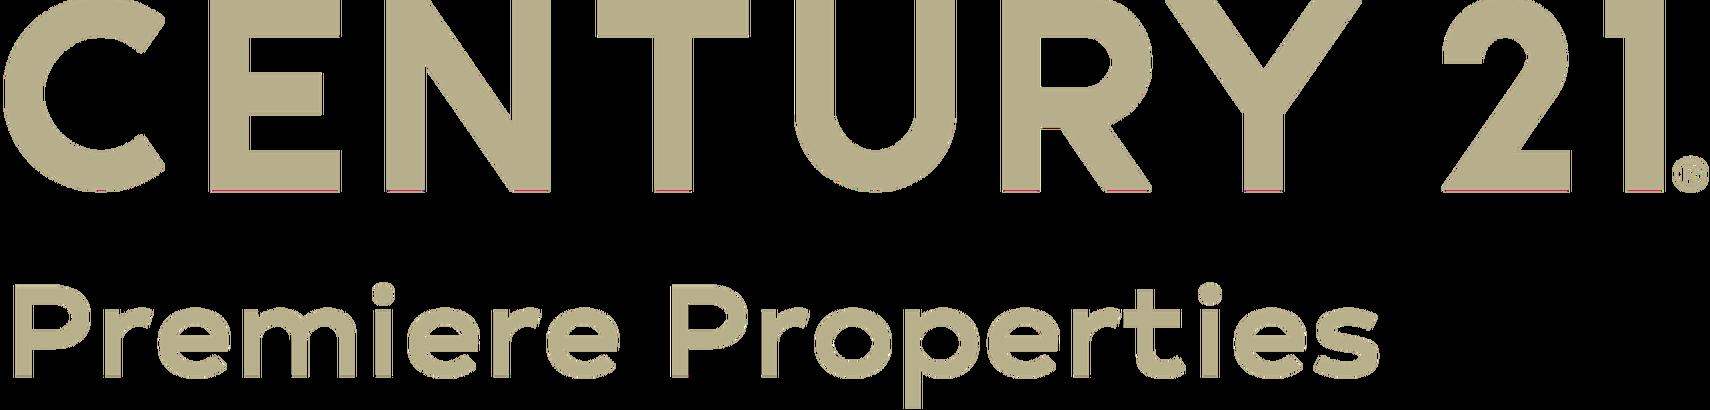 Premiere Properties